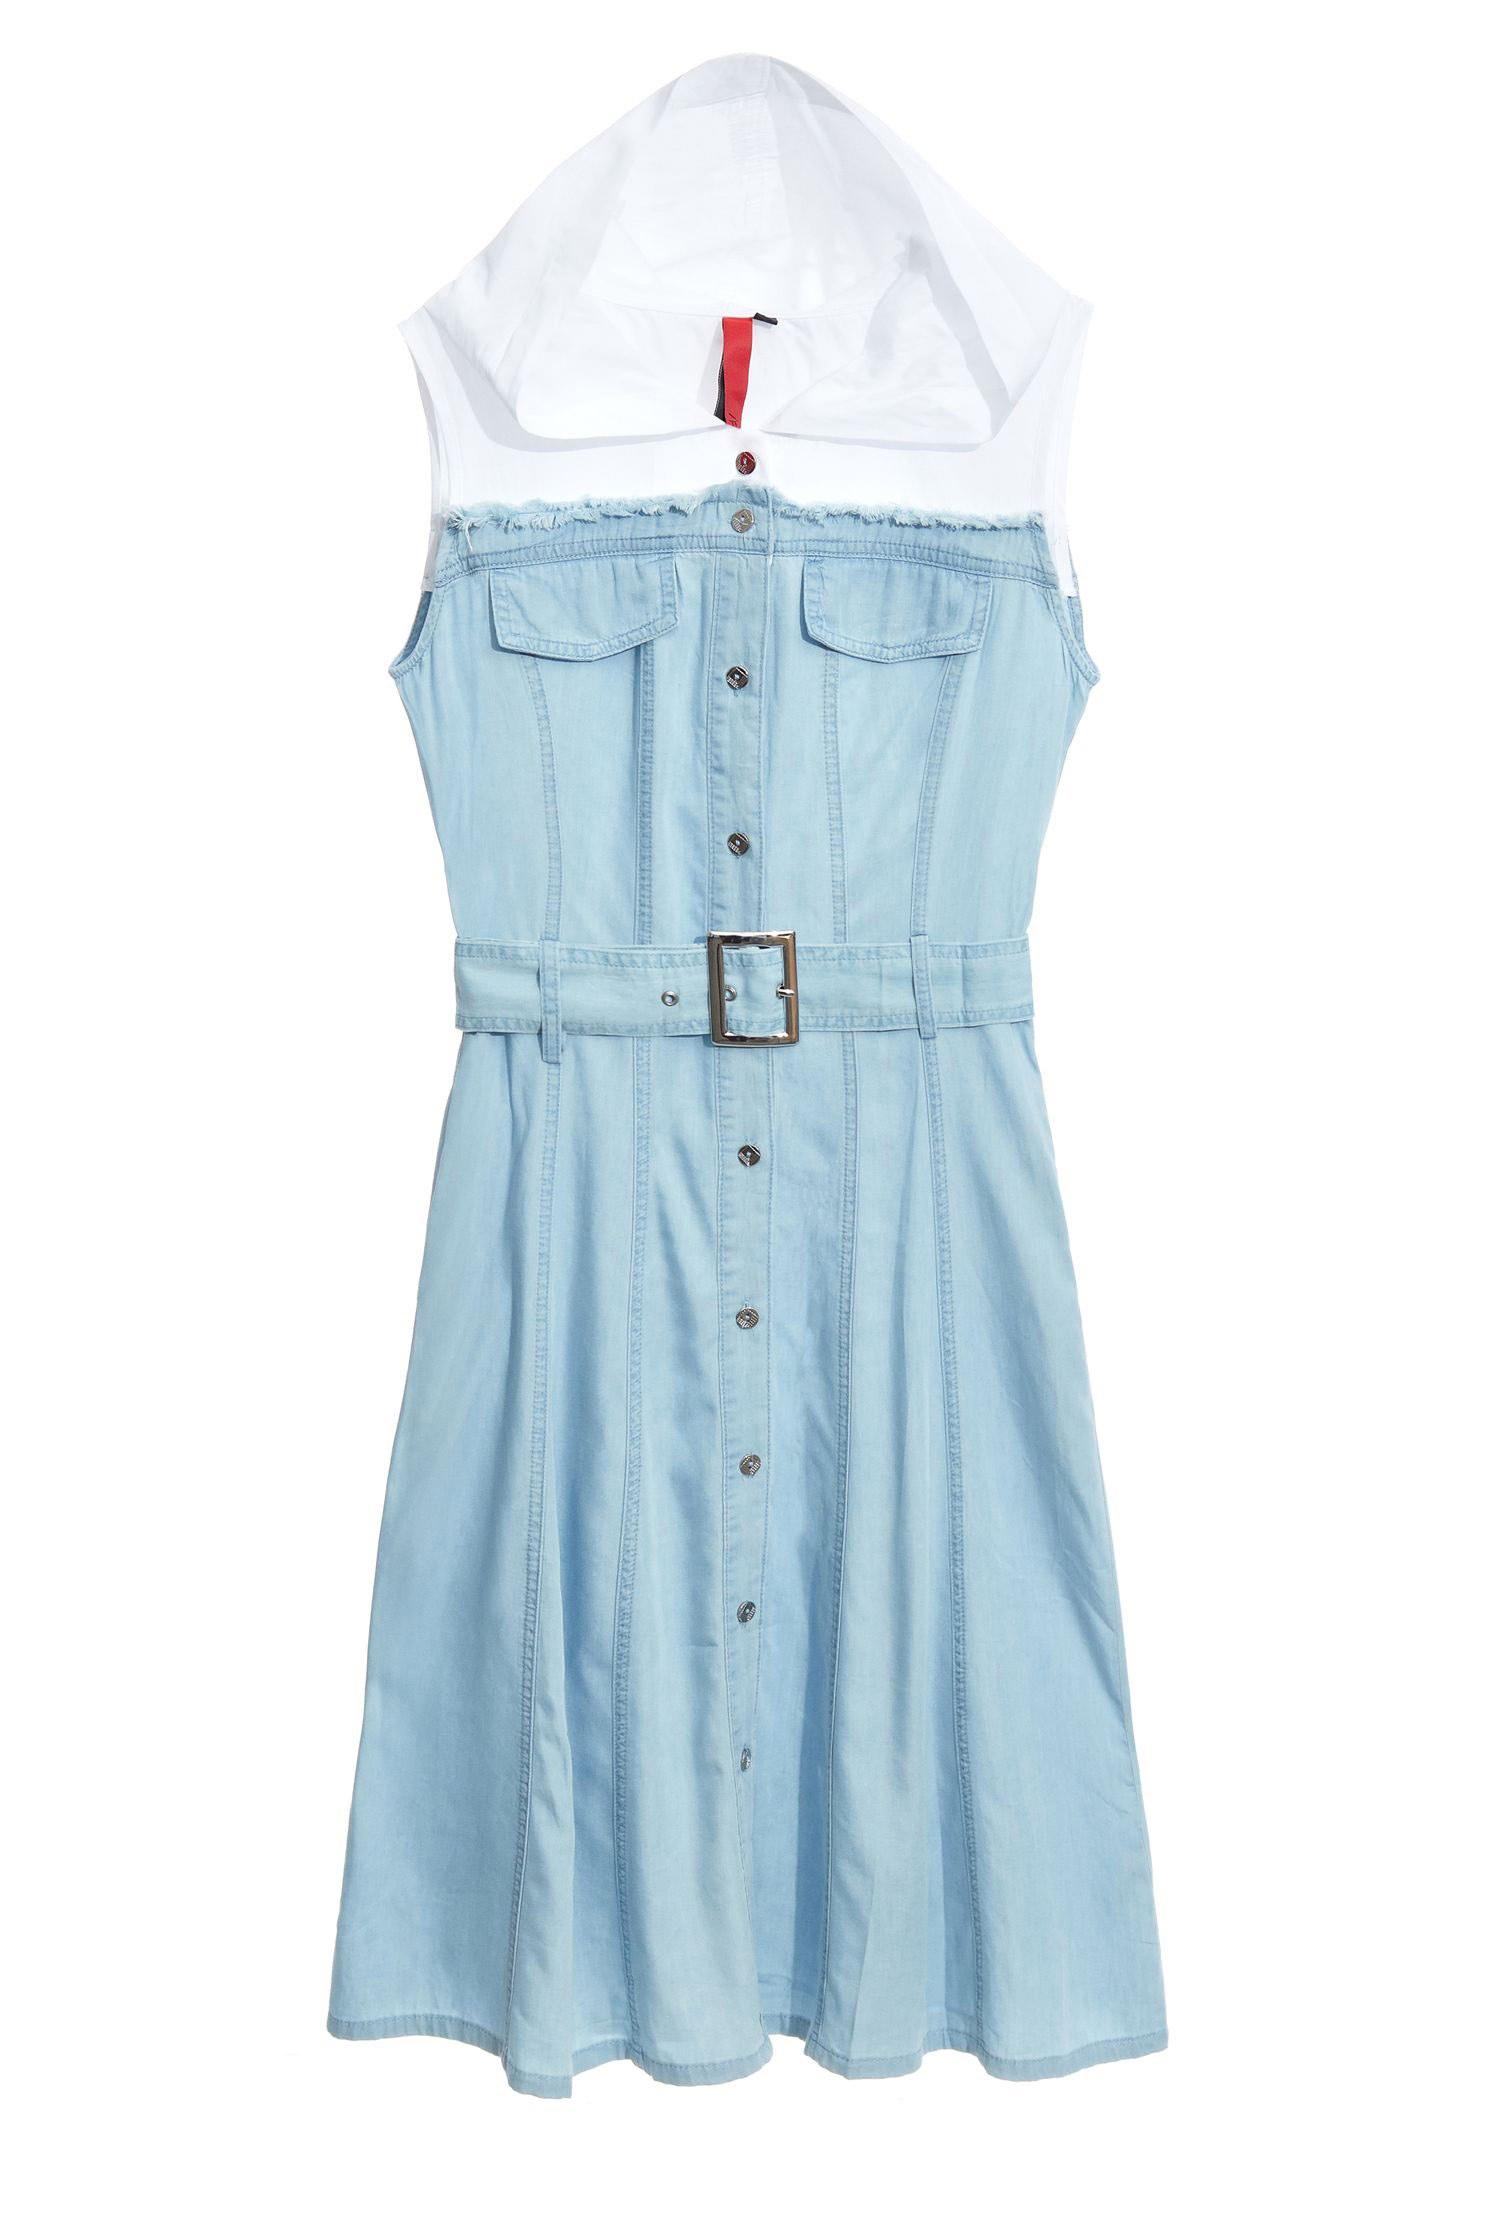 HOODED contrast denim dress